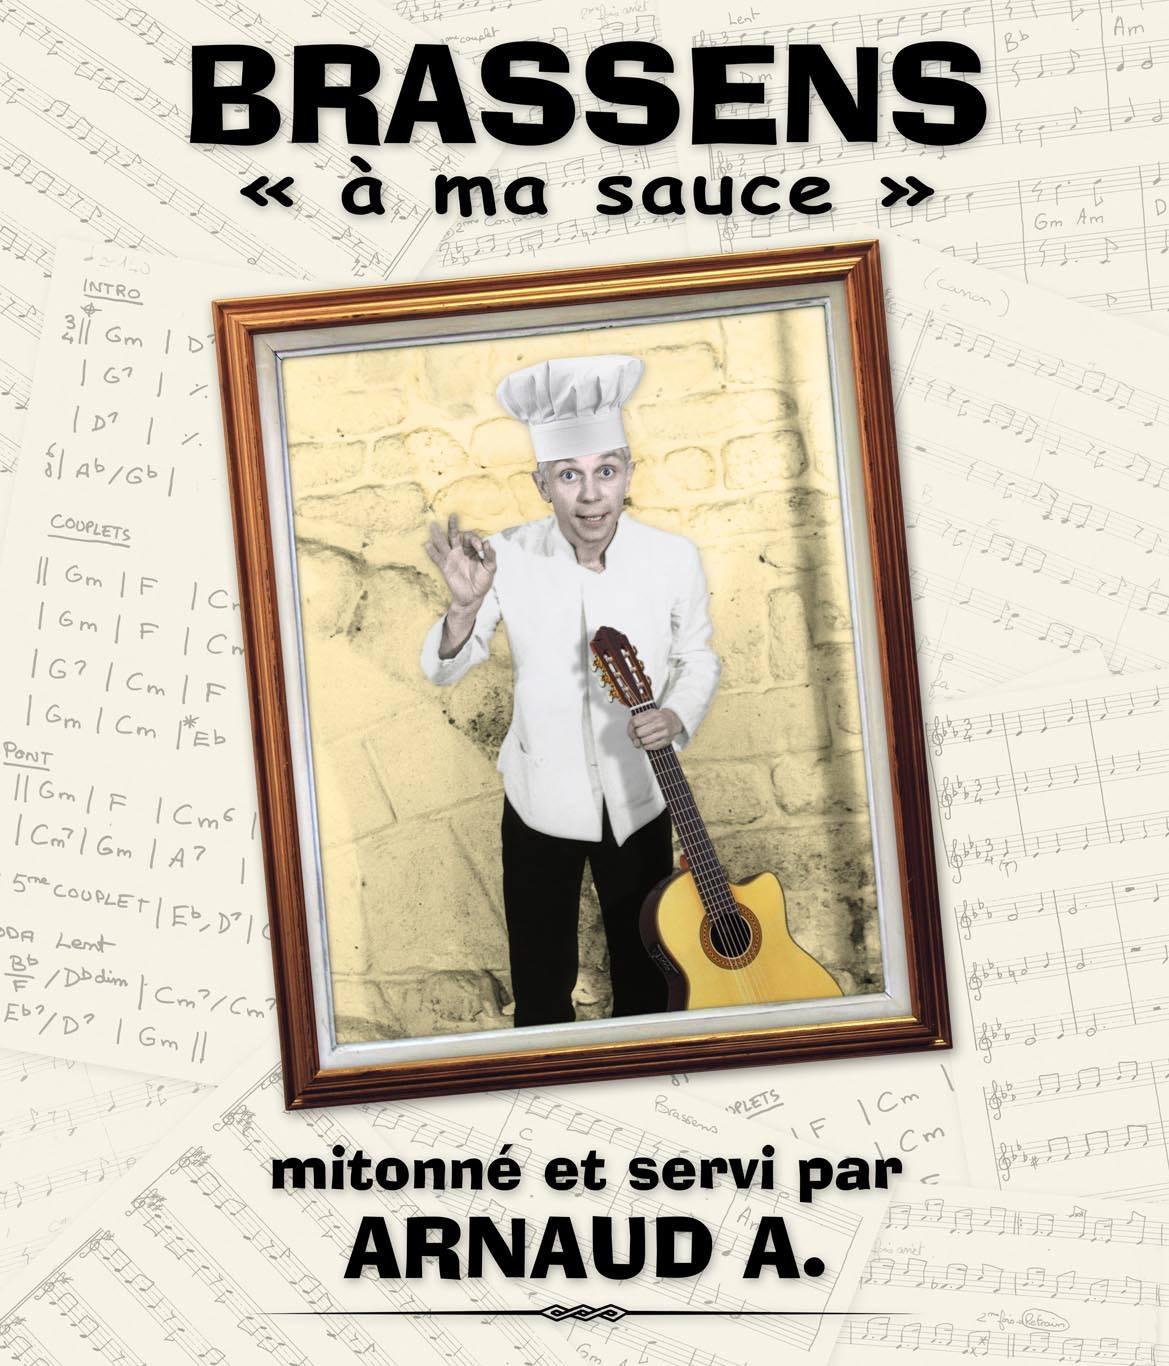 Concert Arnaud A. - Brassens à ma sauce (chanson française)